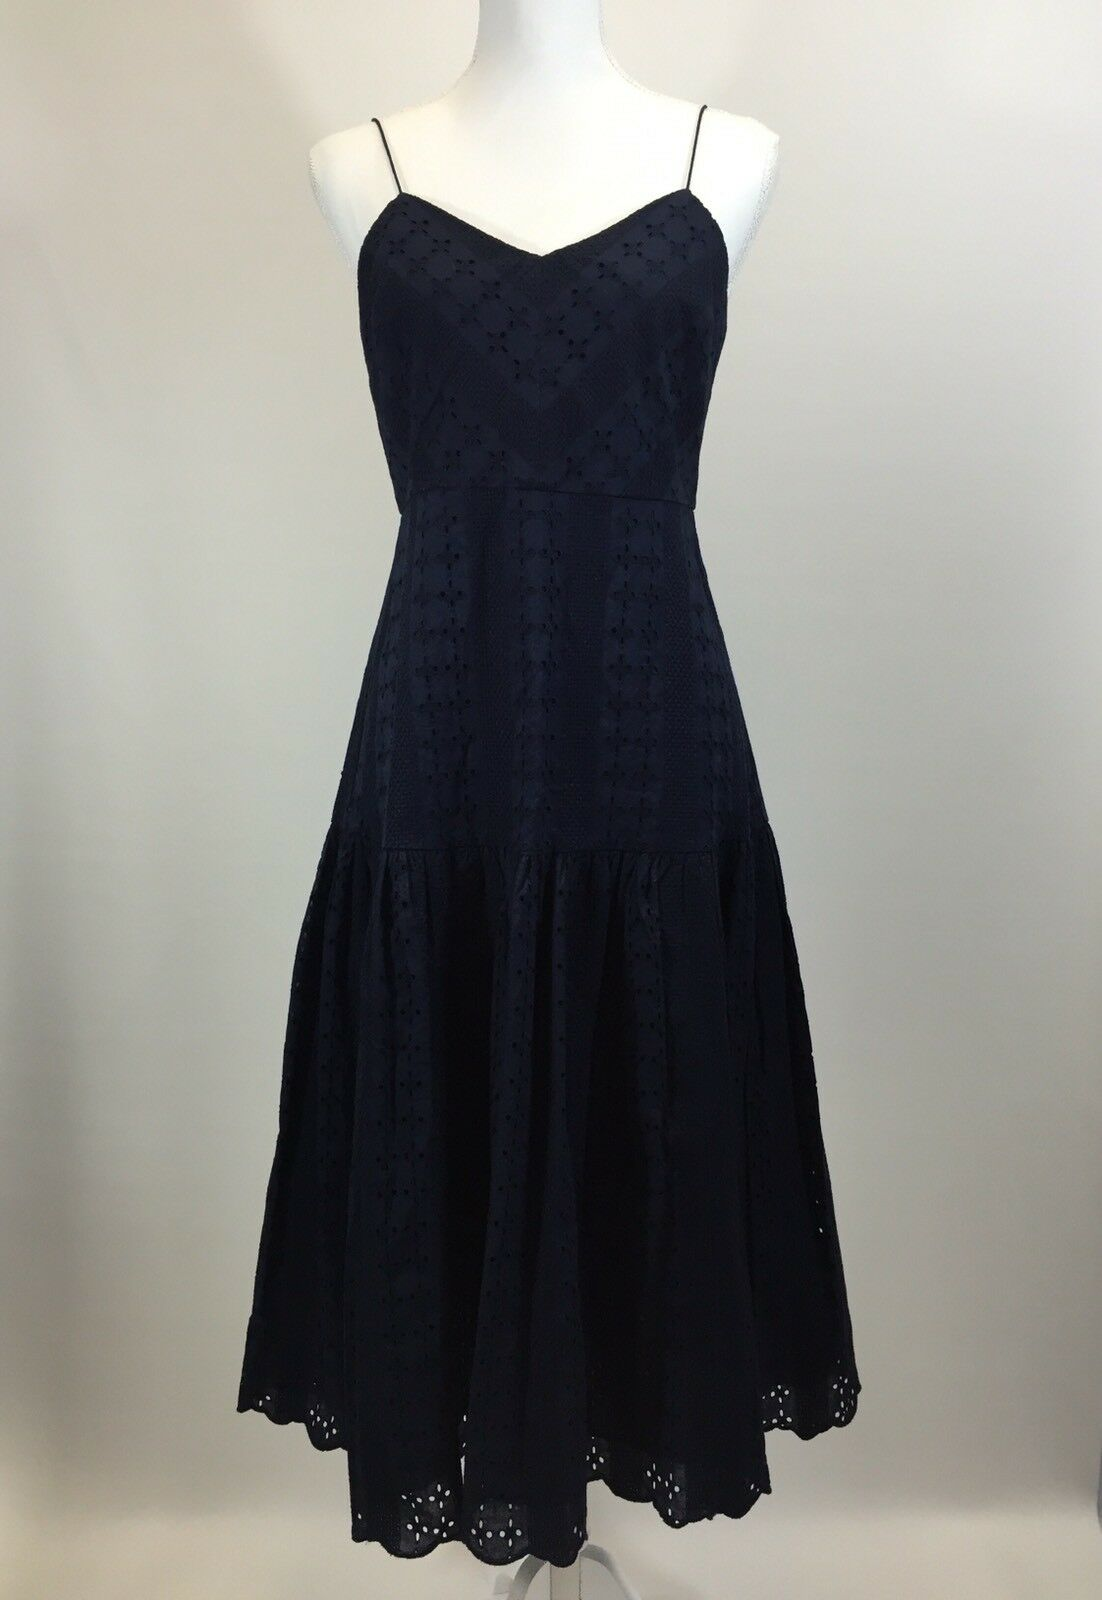 NEW JCrew  Tiered Spaghetti-Strap Midi Dress in Eyelet Size 4 Navy G3549